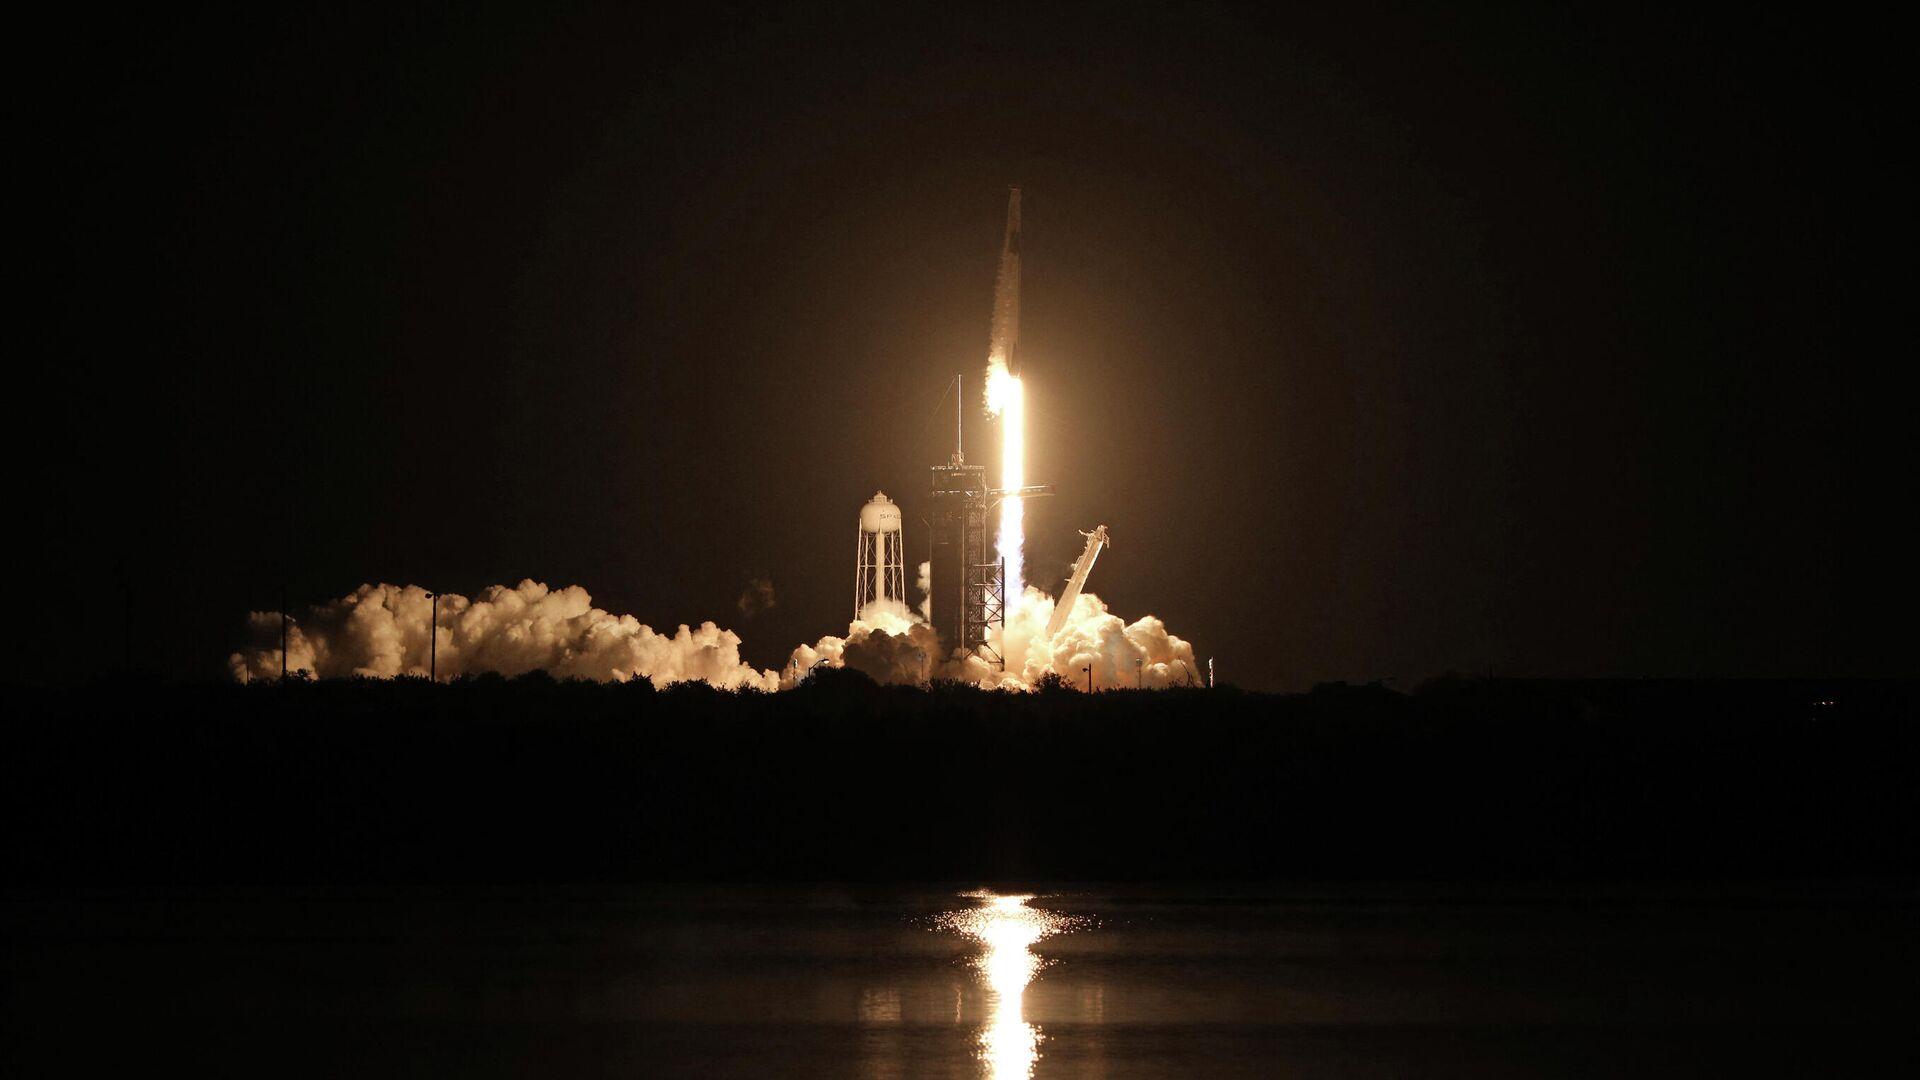 Lanzamiento de un cohete reutilizable Falcon 9 - Sputnik Mundo, 1920, 01.07.2021